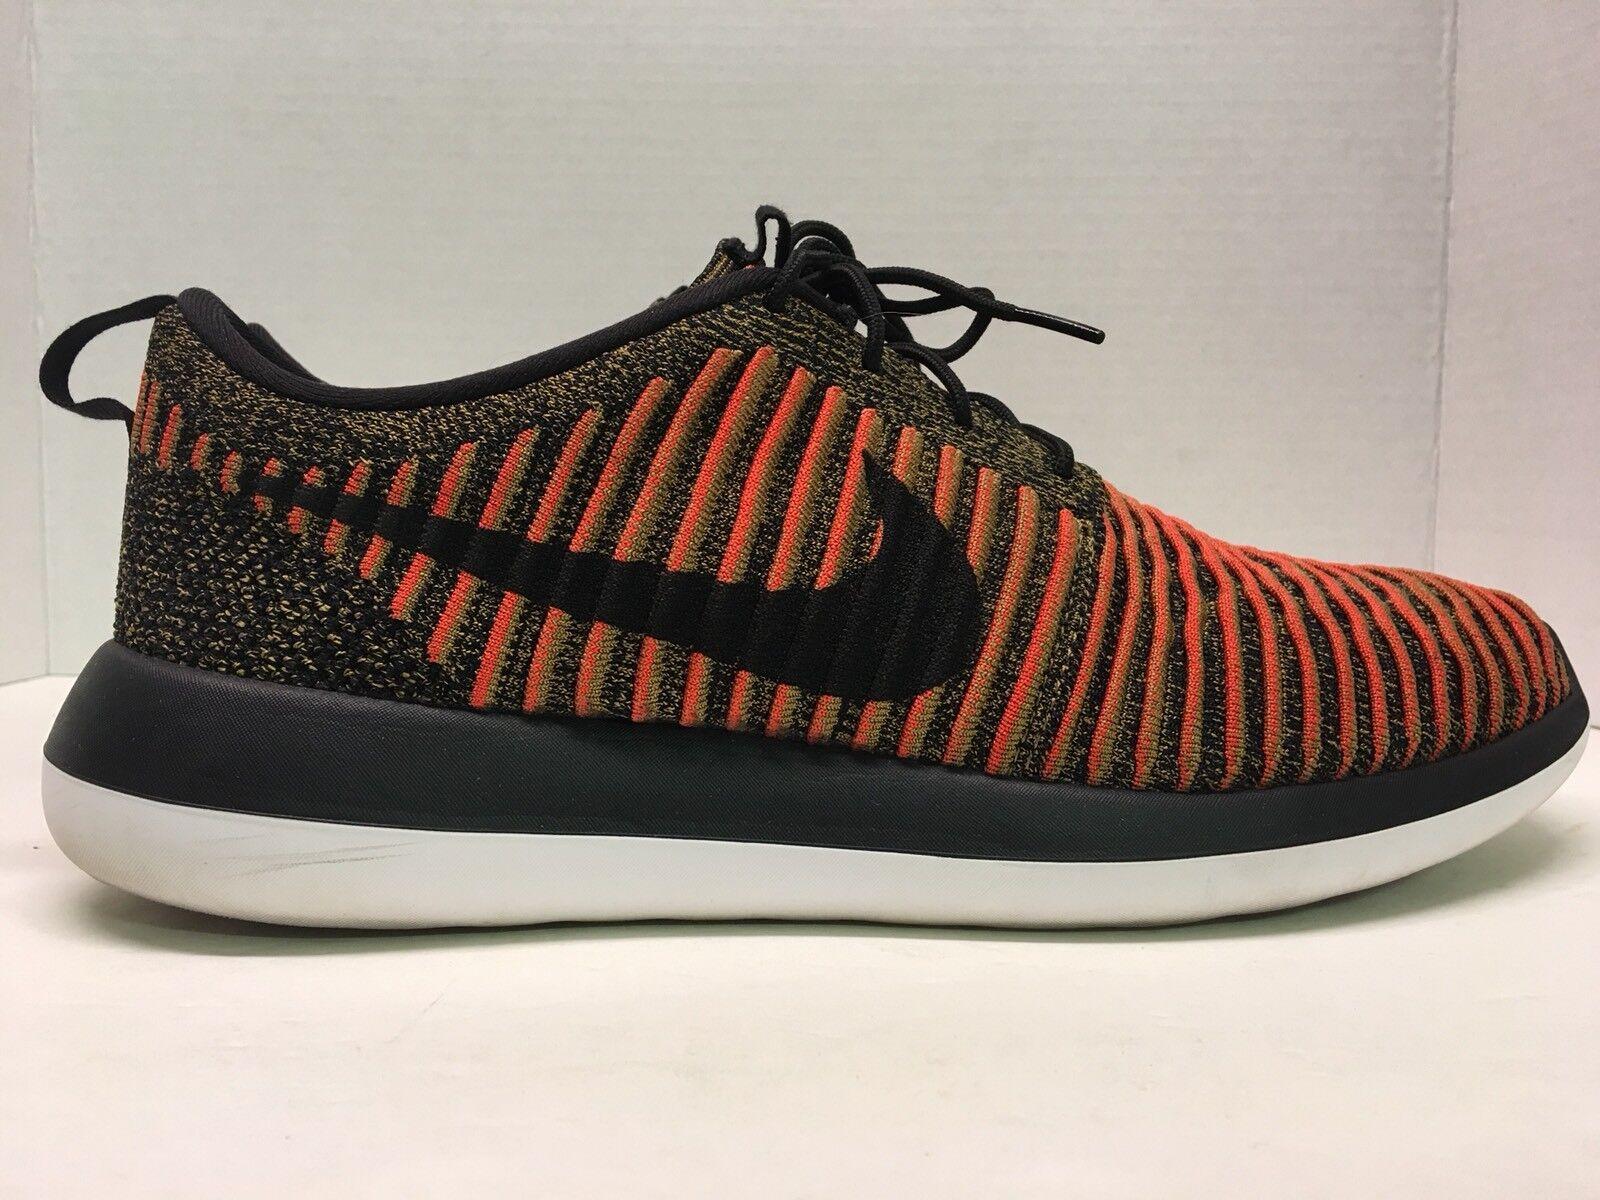 Nike Roshe Two Flyknit Flyknit Flyknit 2 mens sneakers black max orange 844833-009 Rare shoes SF 662379